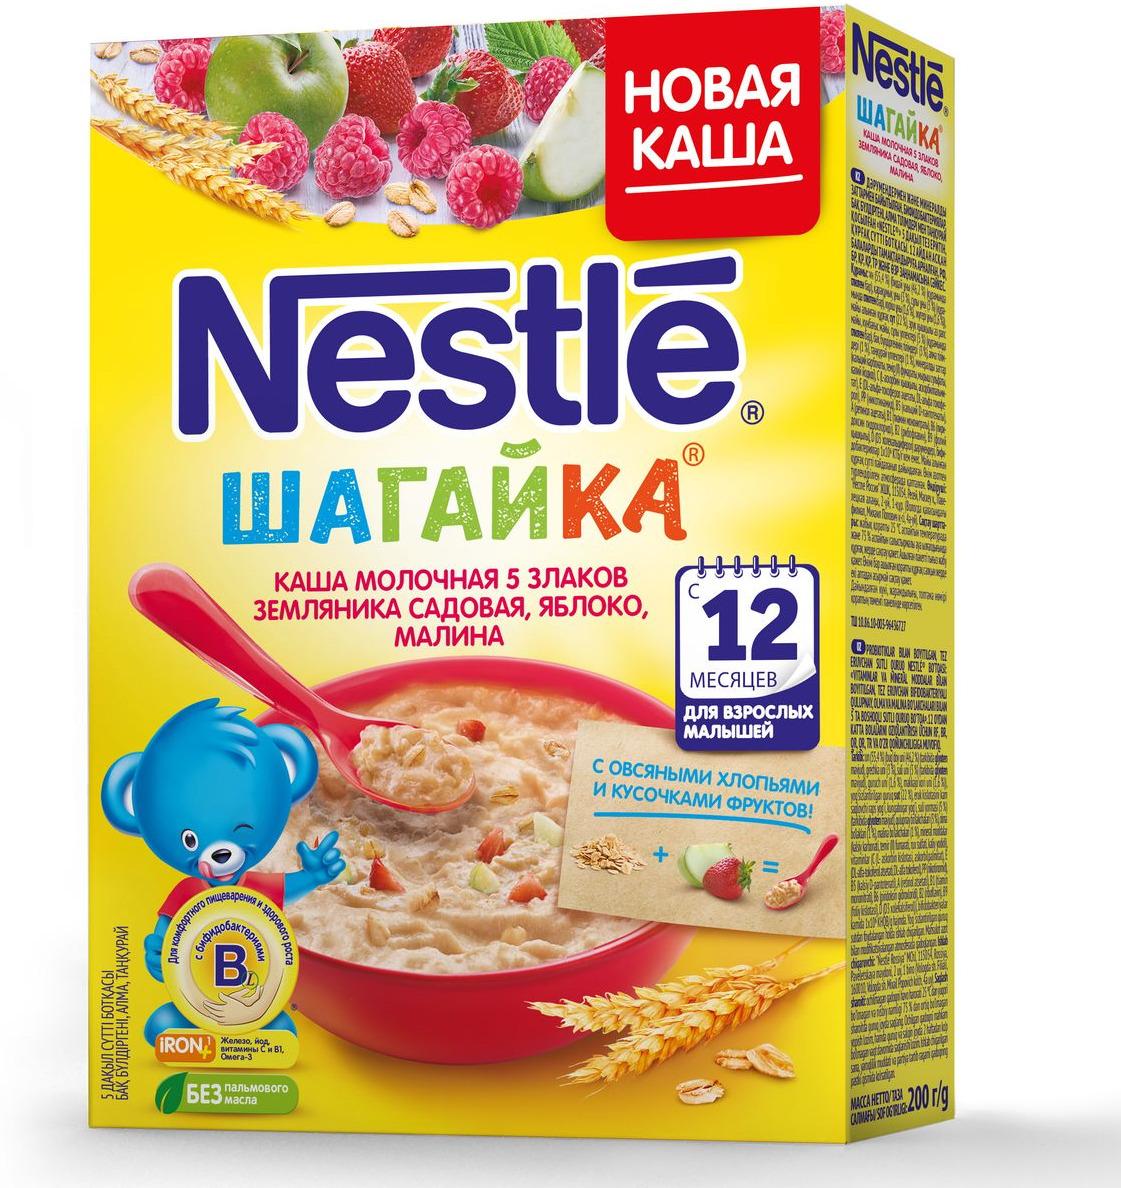 Nestle 5 злаков земляника малина яблоко каша молочная, 220 г nestle 900